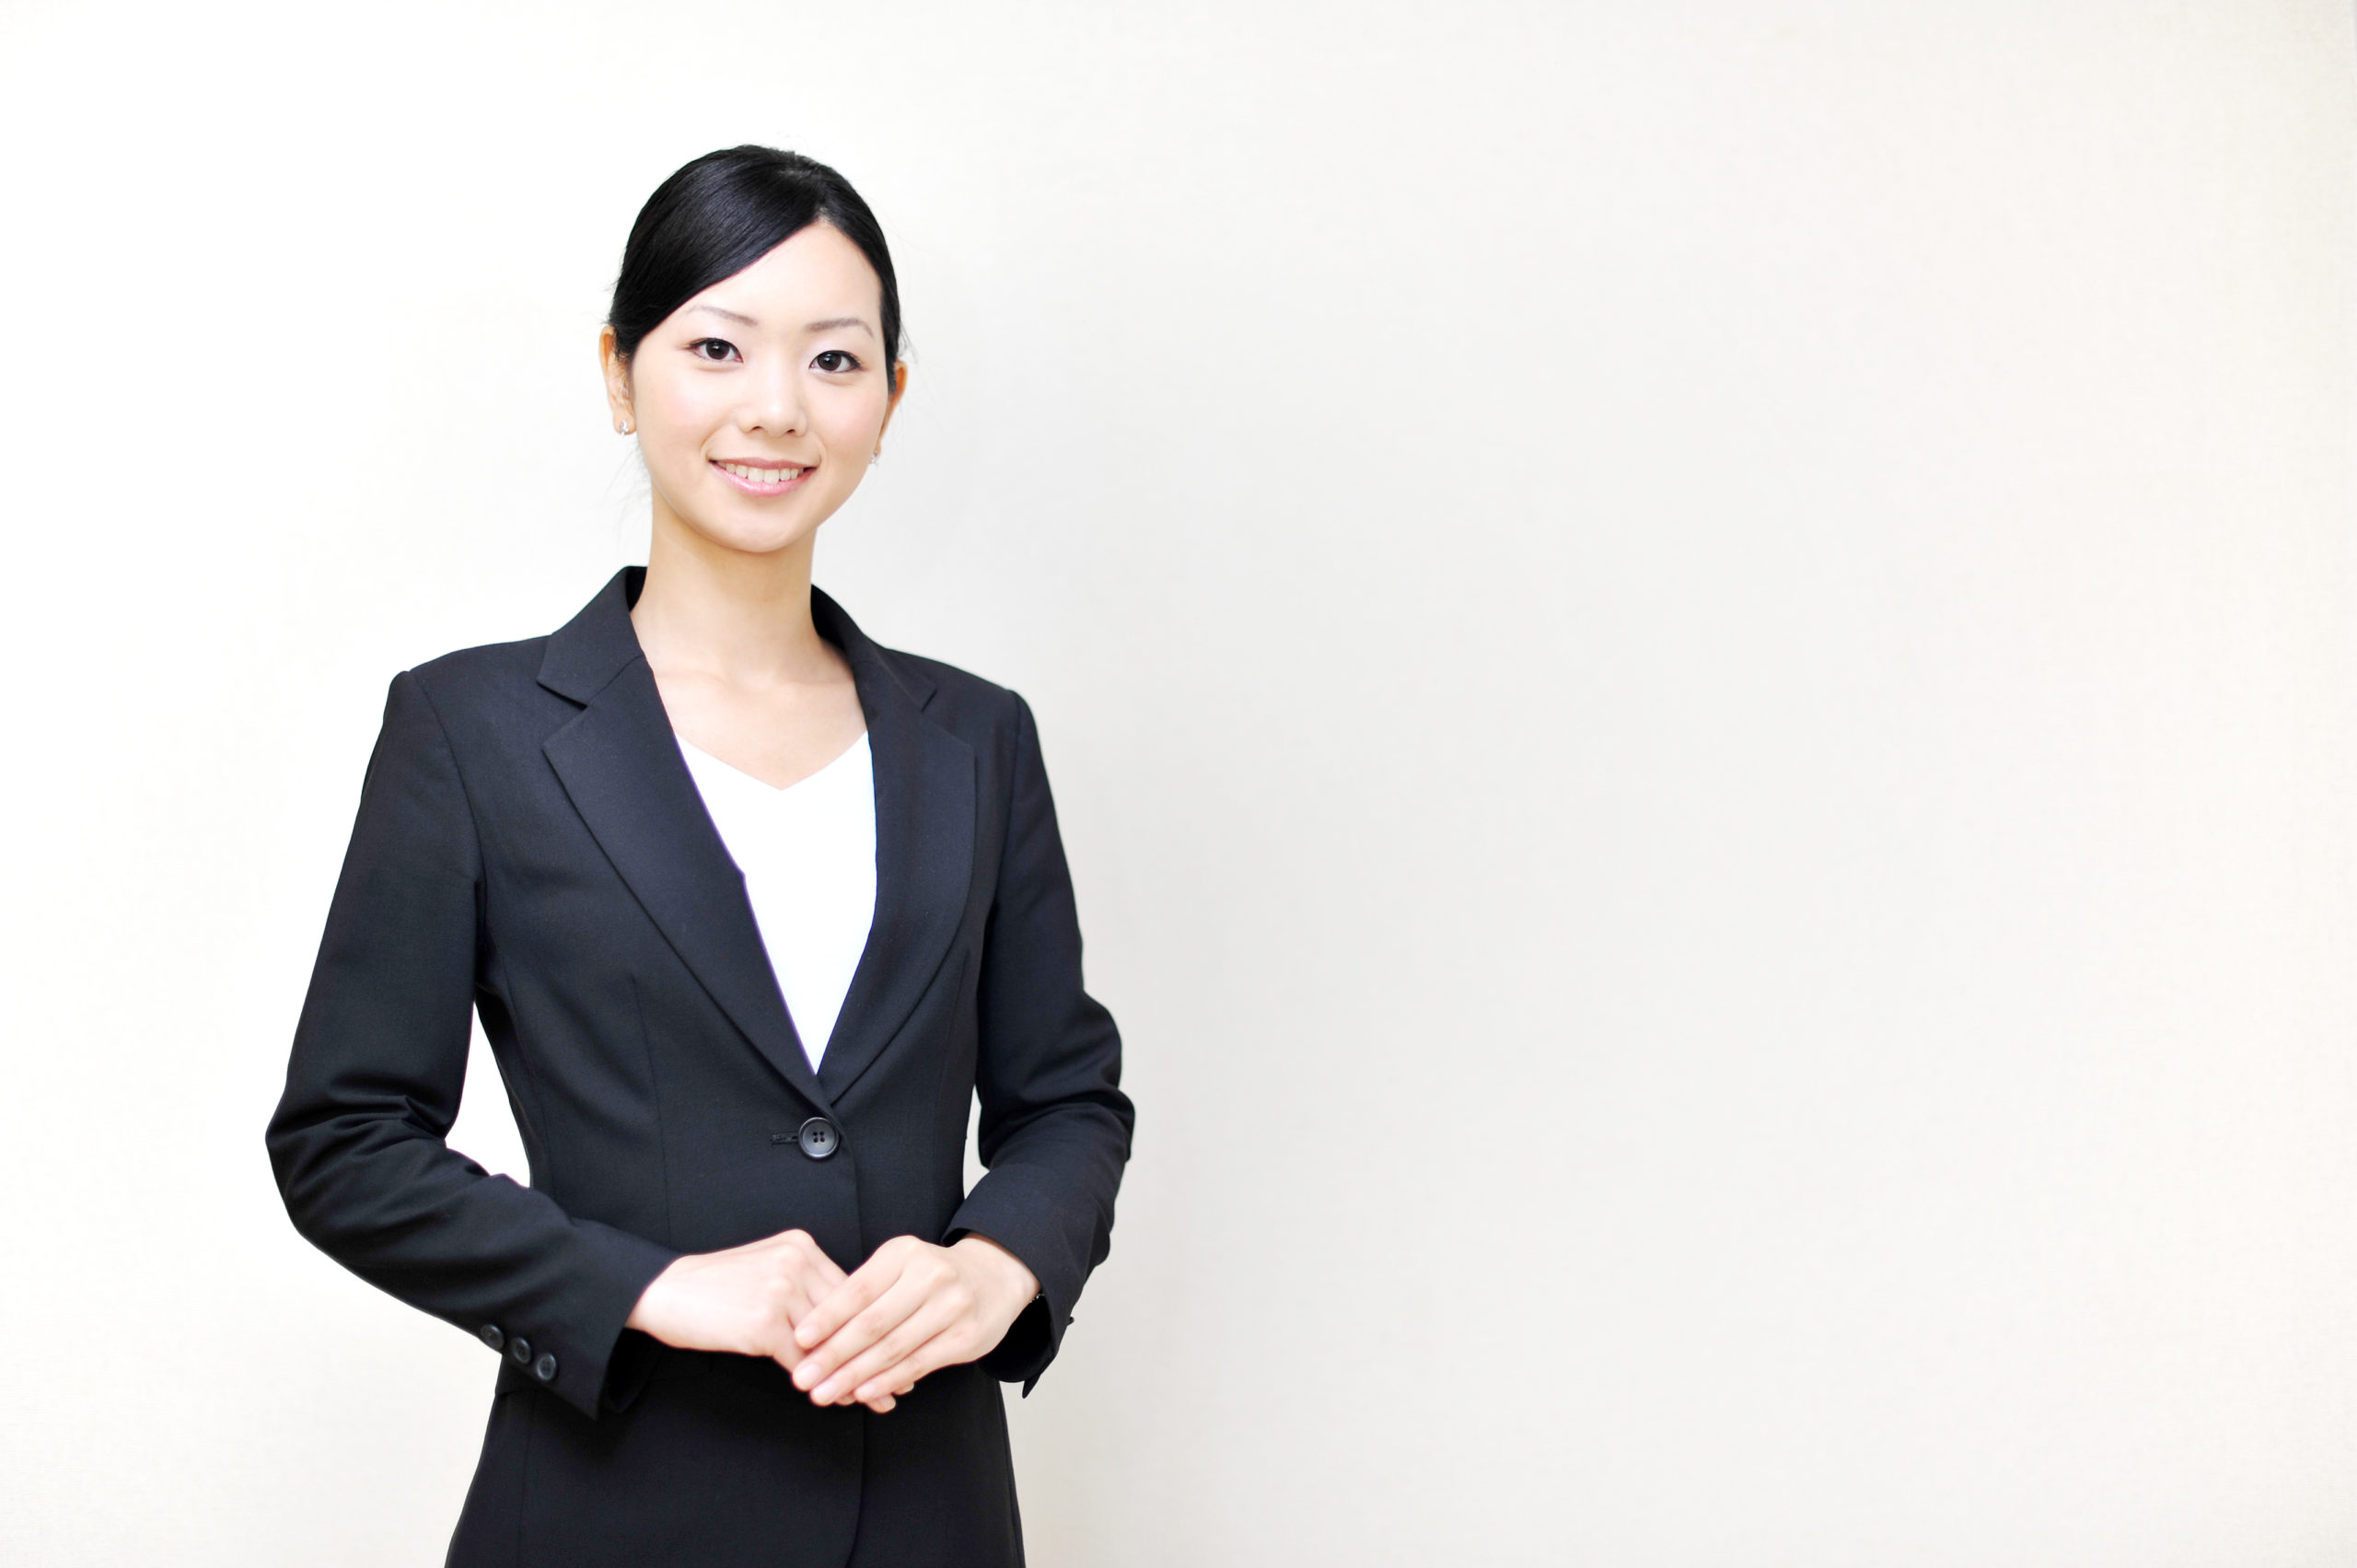 portrait-young-asian-woman-60827533